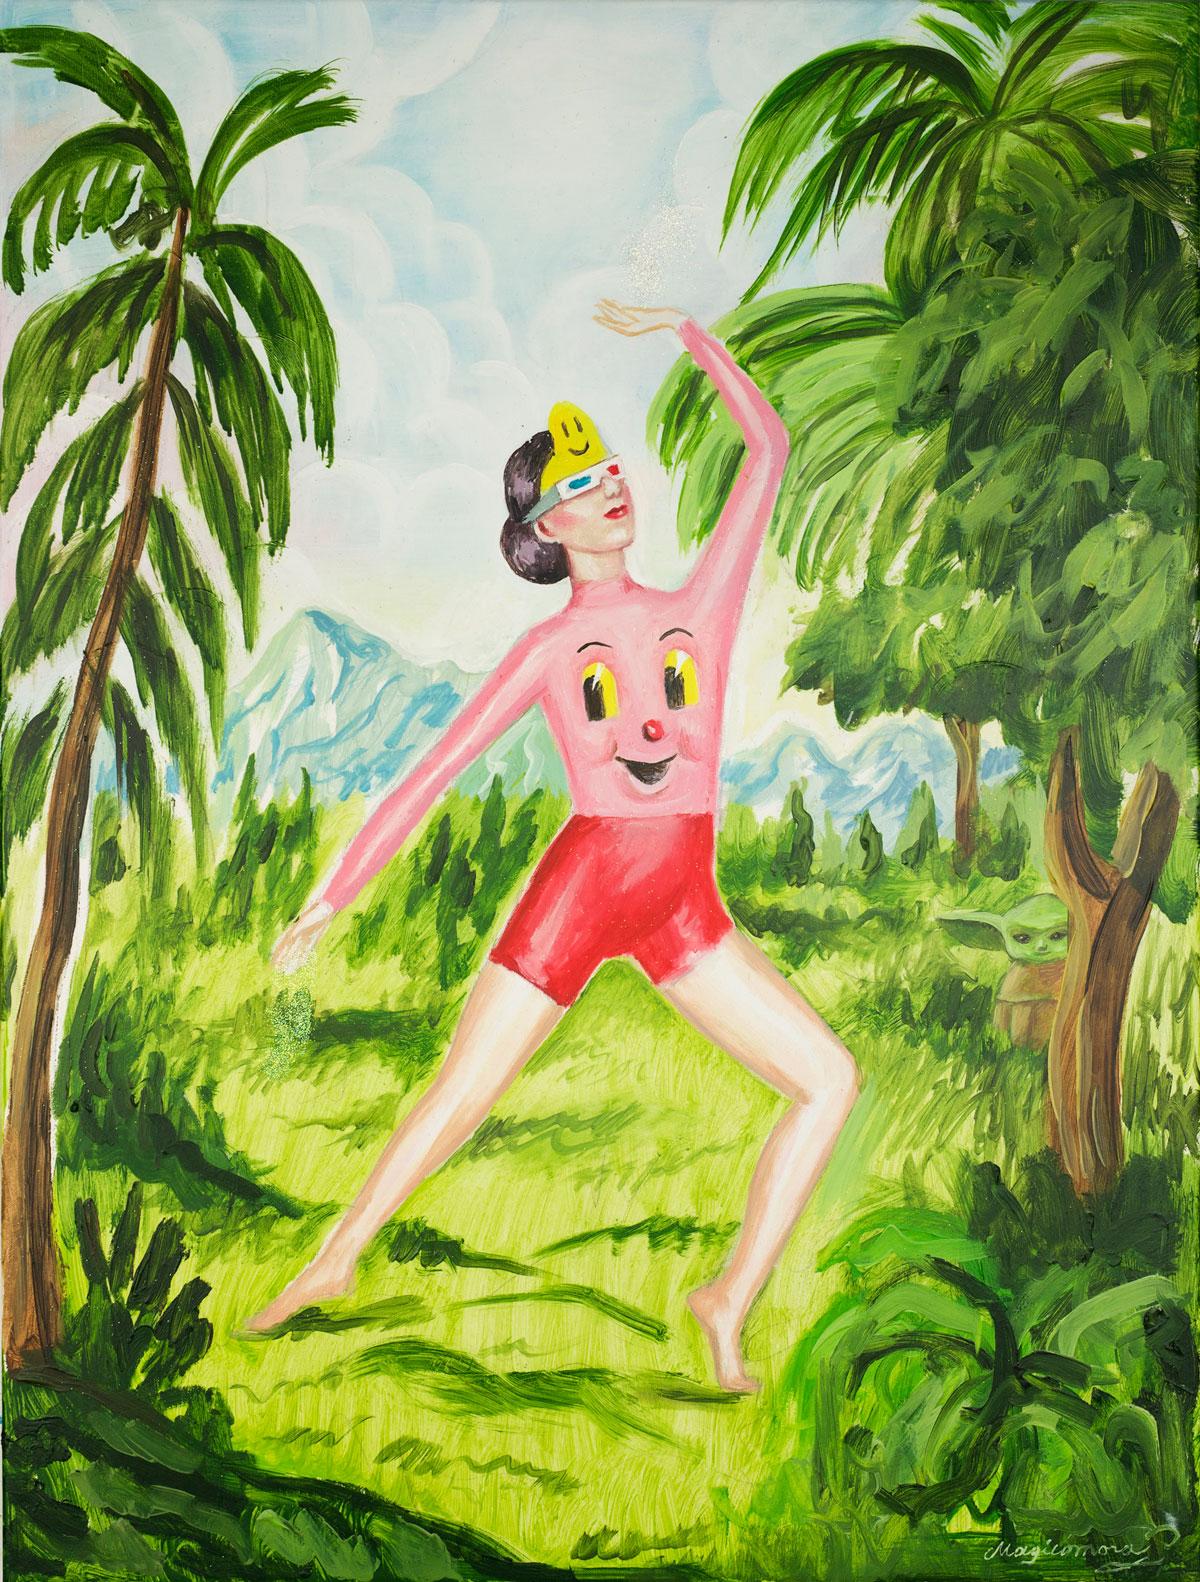 Sergio Mora, Space Dancer, 2020, oil on canvas, 61,5x46 cm